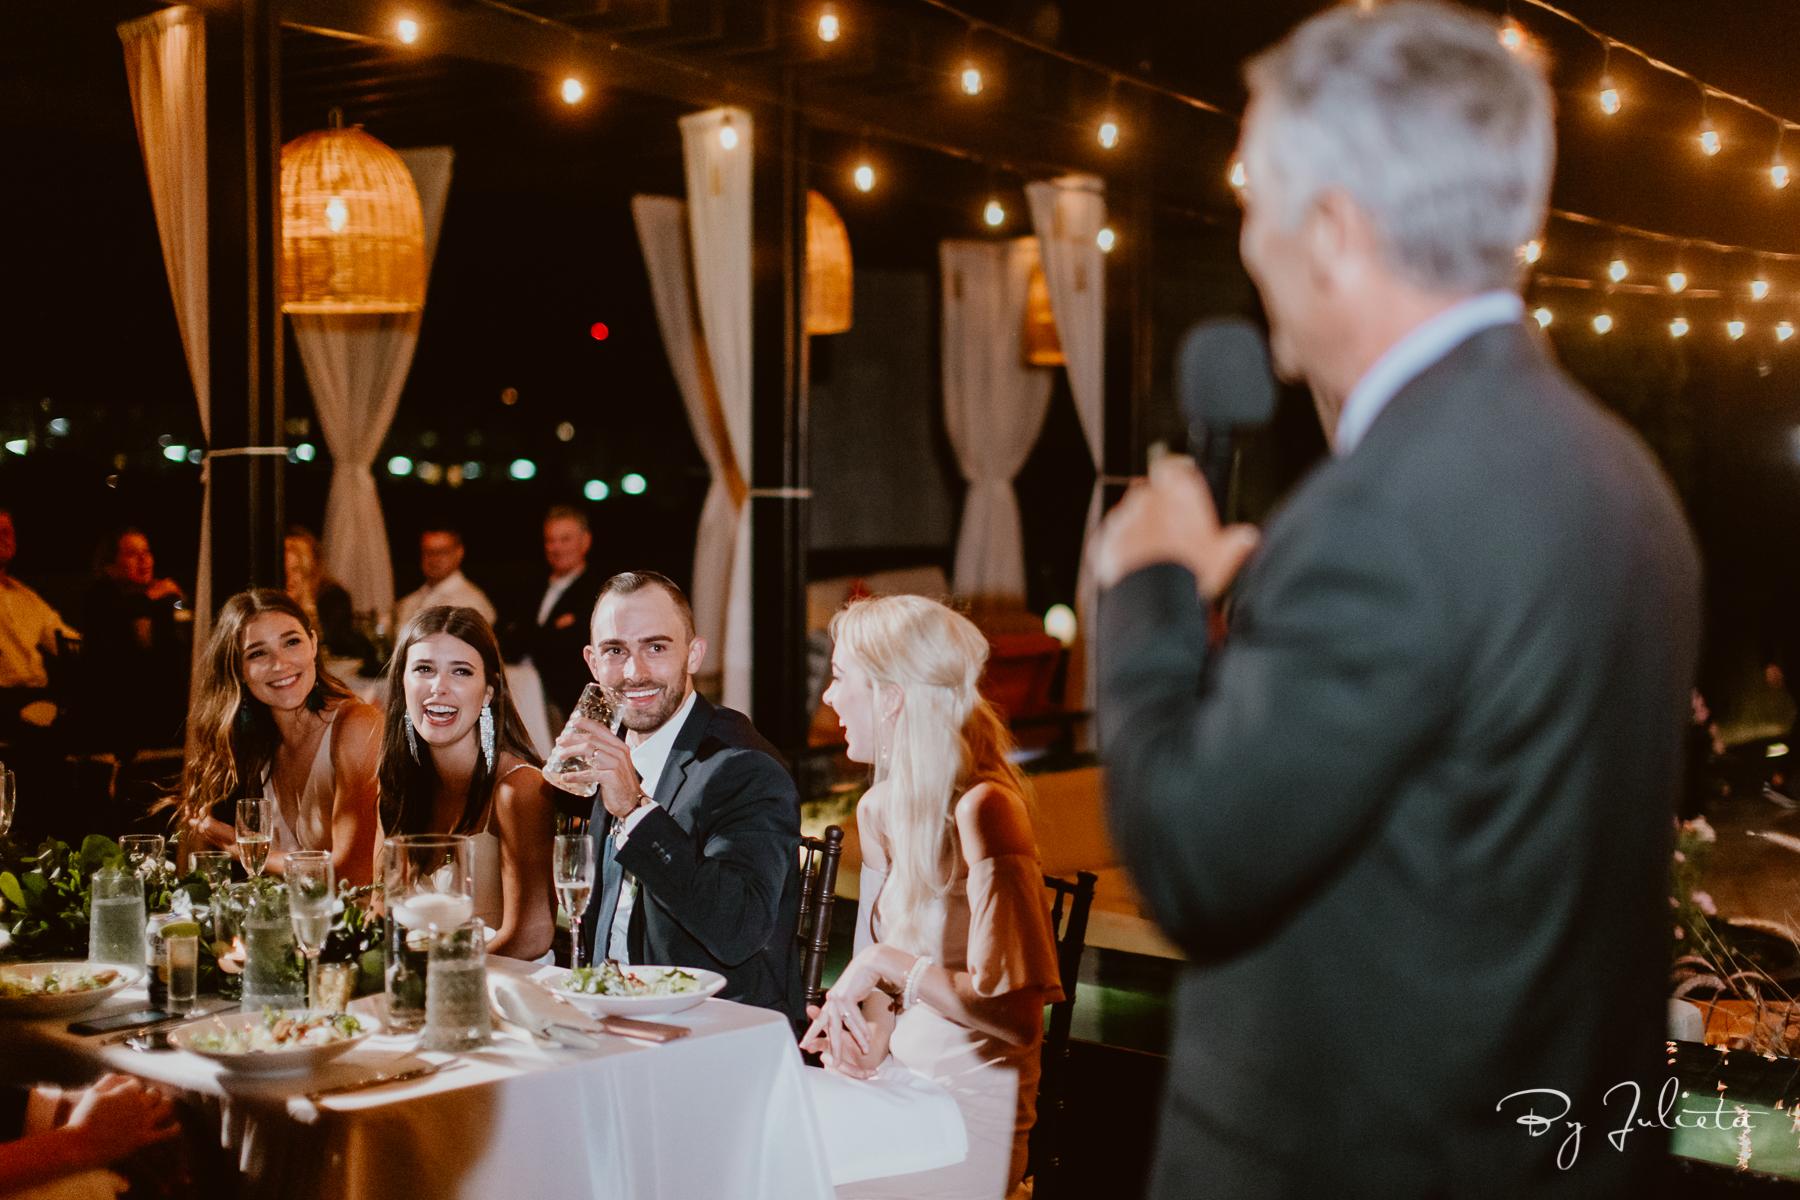 WeddingTheCapeCabo.B+G.JulietaAmezcuaPhotography.(518of533).jpg